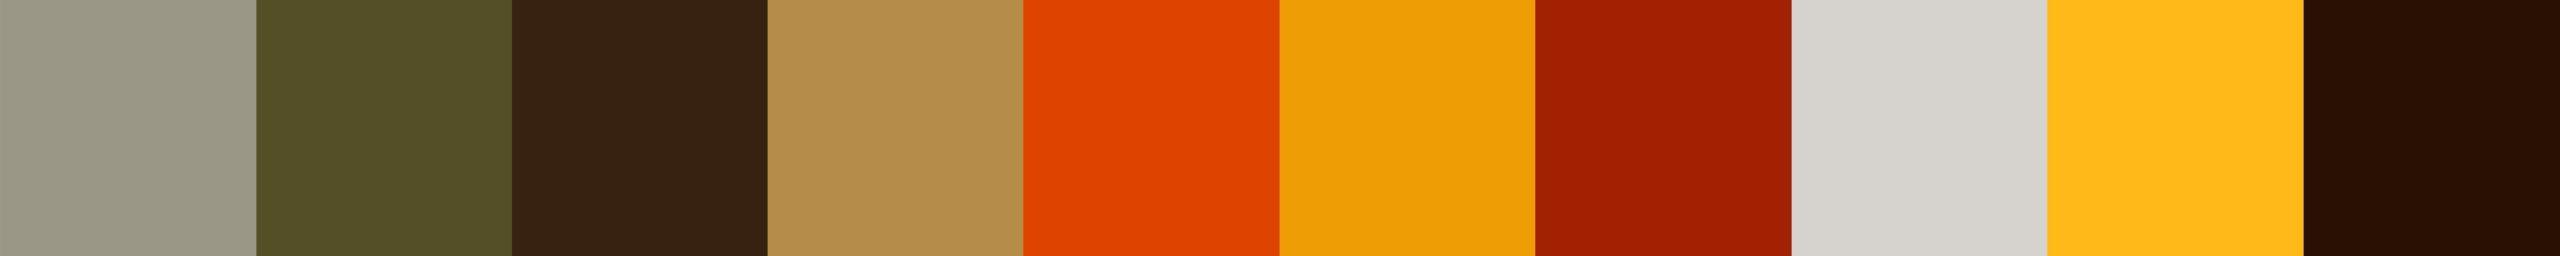 56 Lobestica Color Palette